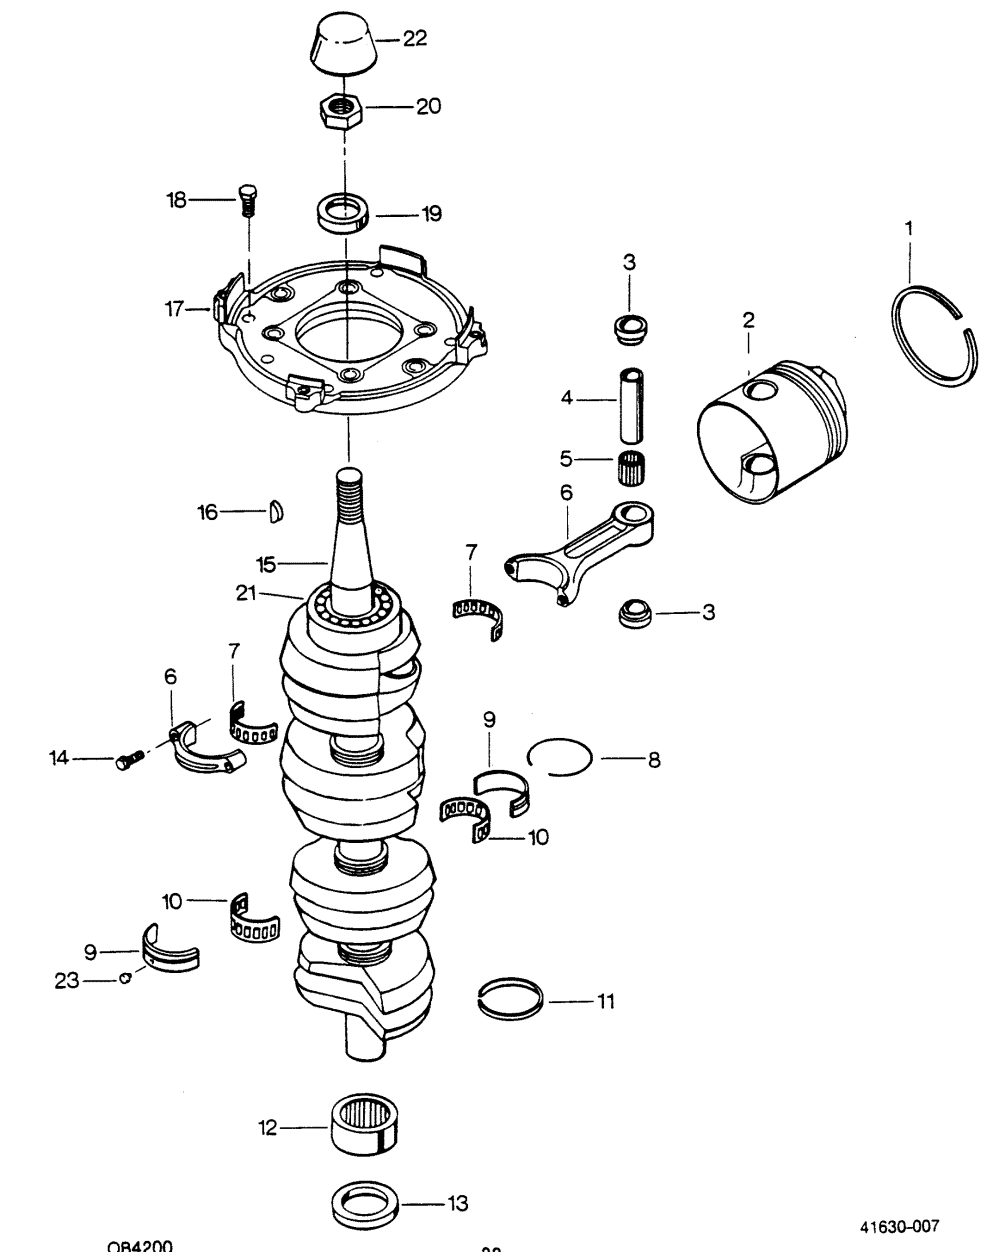 medium resolution of mercury force 125 h p 1988 1258m8c crankshaft 1971 mercury outboard wiring diagram 25 hp mercury outboard wiring diagram